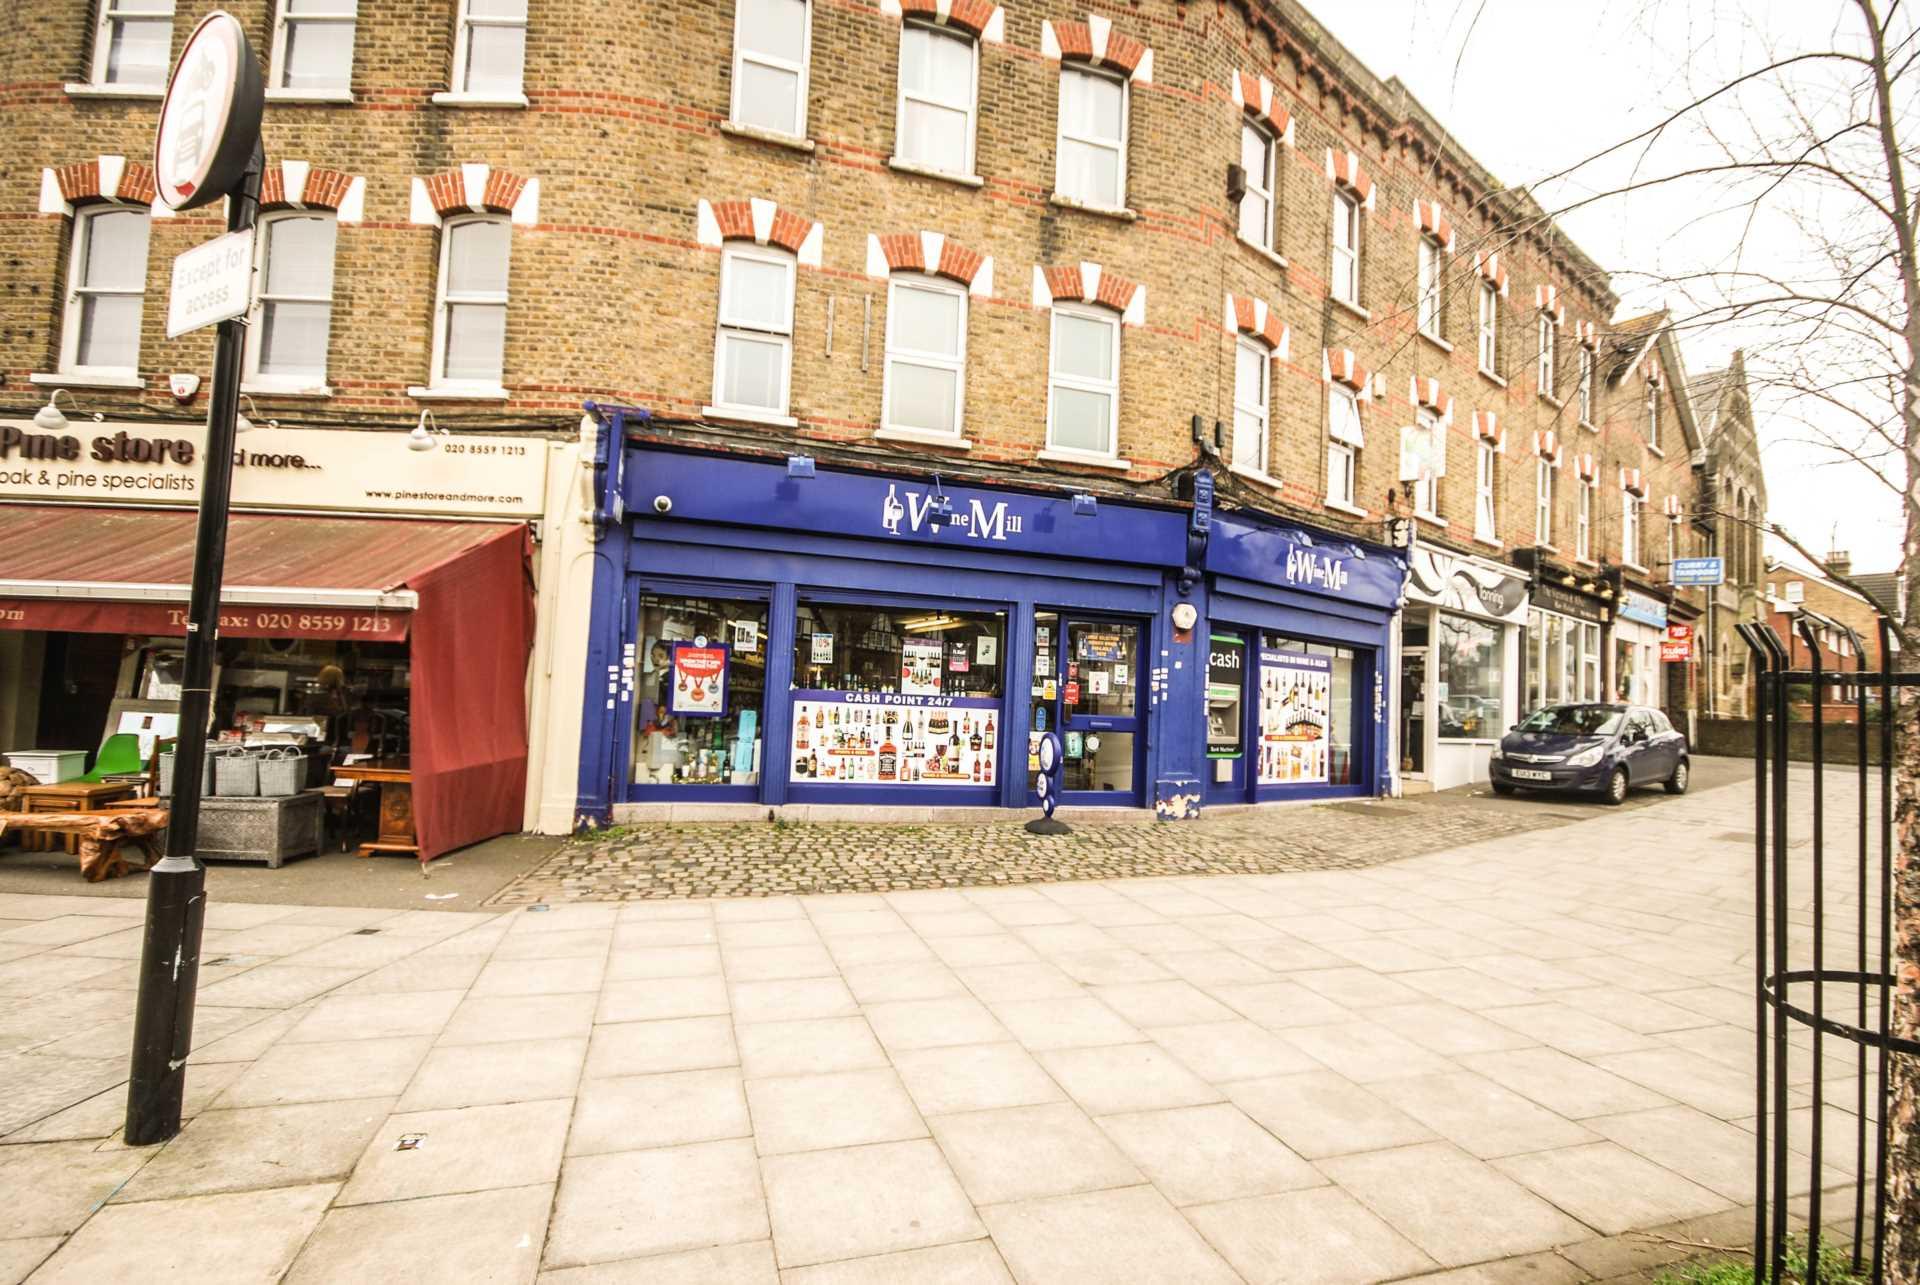 High Road Woodford Green, London, Image 9